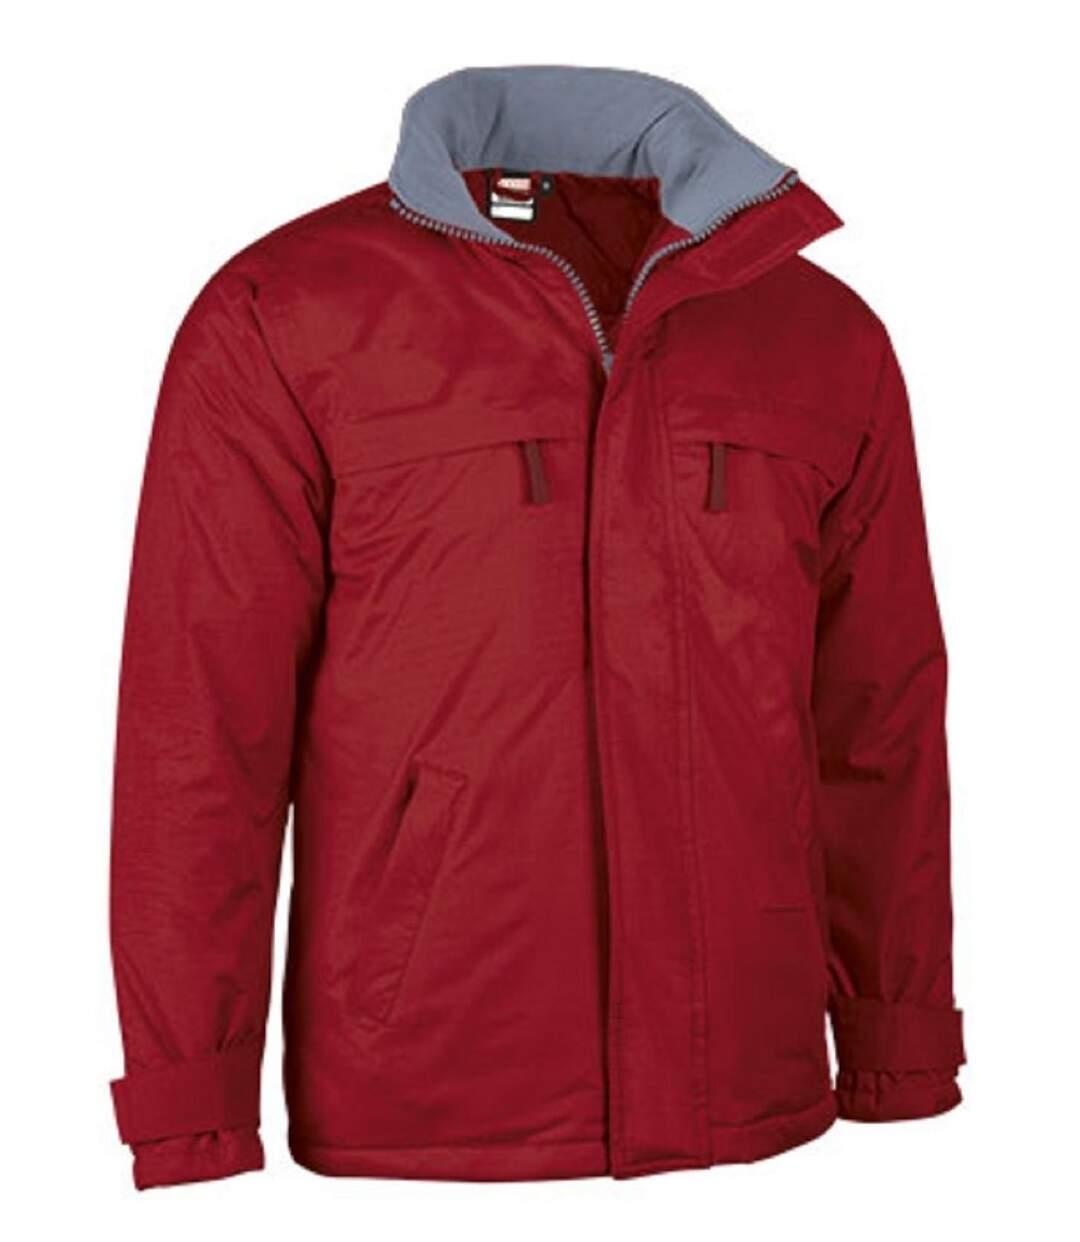 Parka - Homme - REF BOREAL - rouge